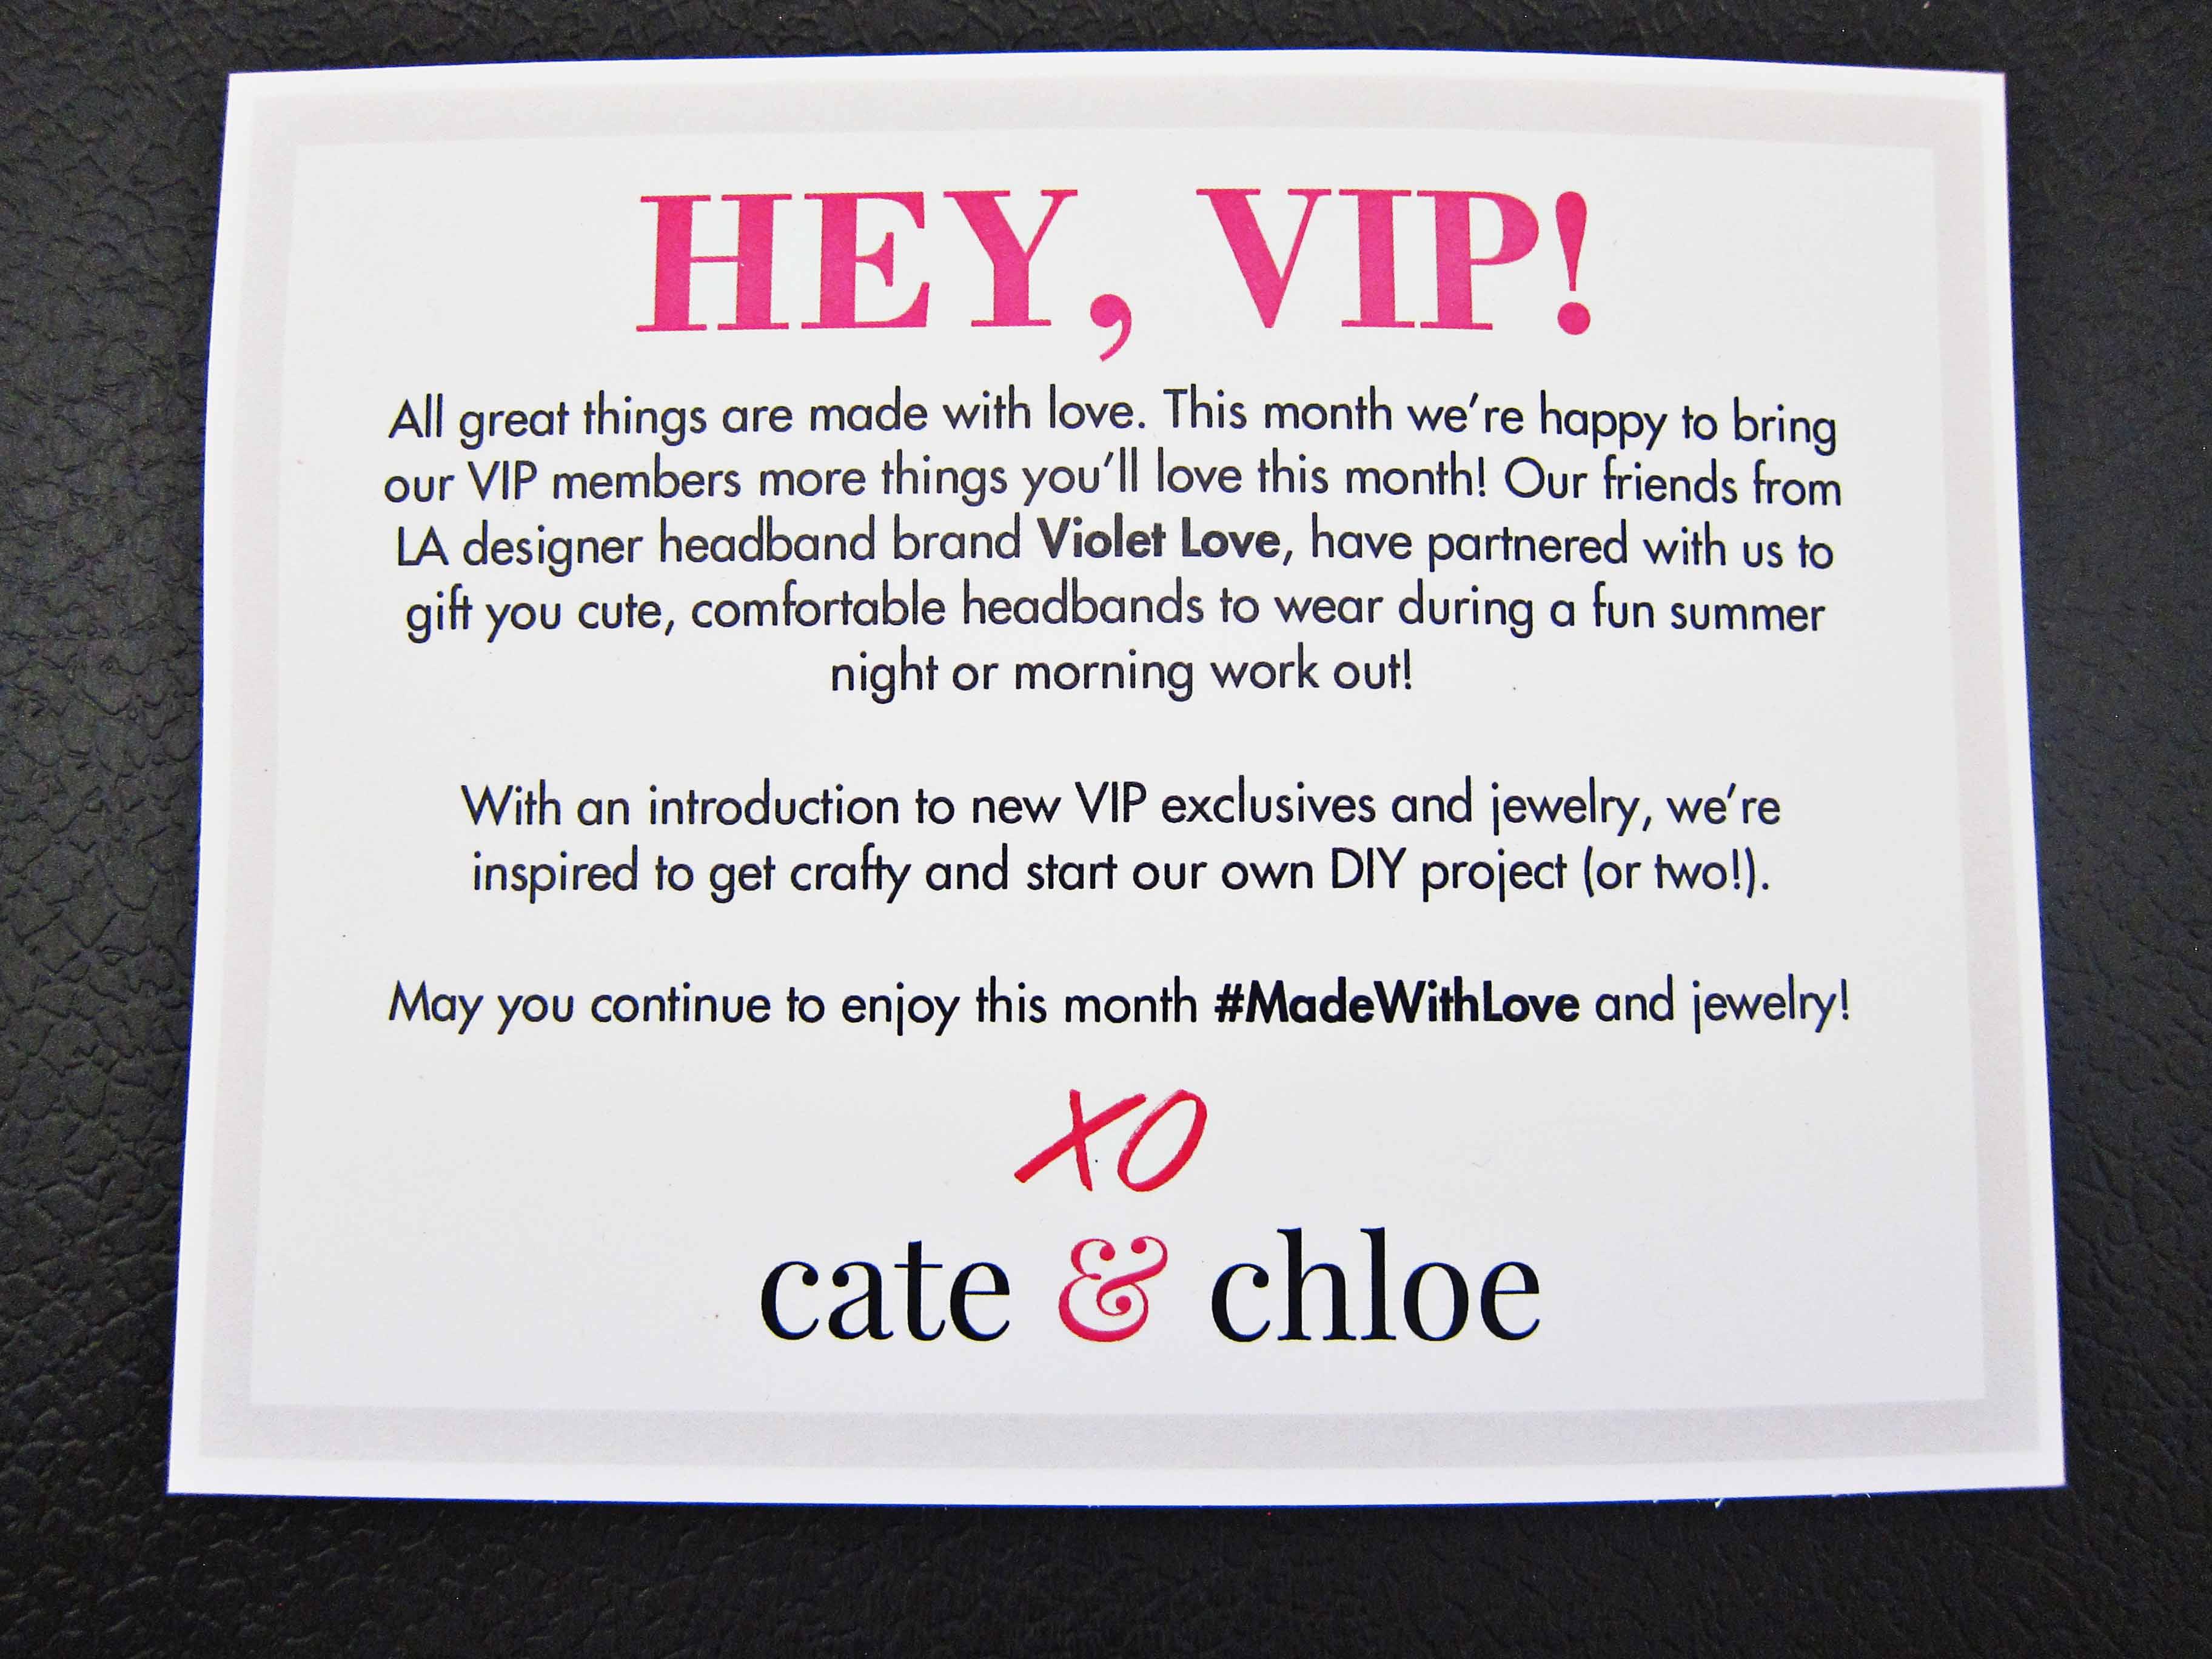 Cate & Chloe VIP August 2016 Info Card